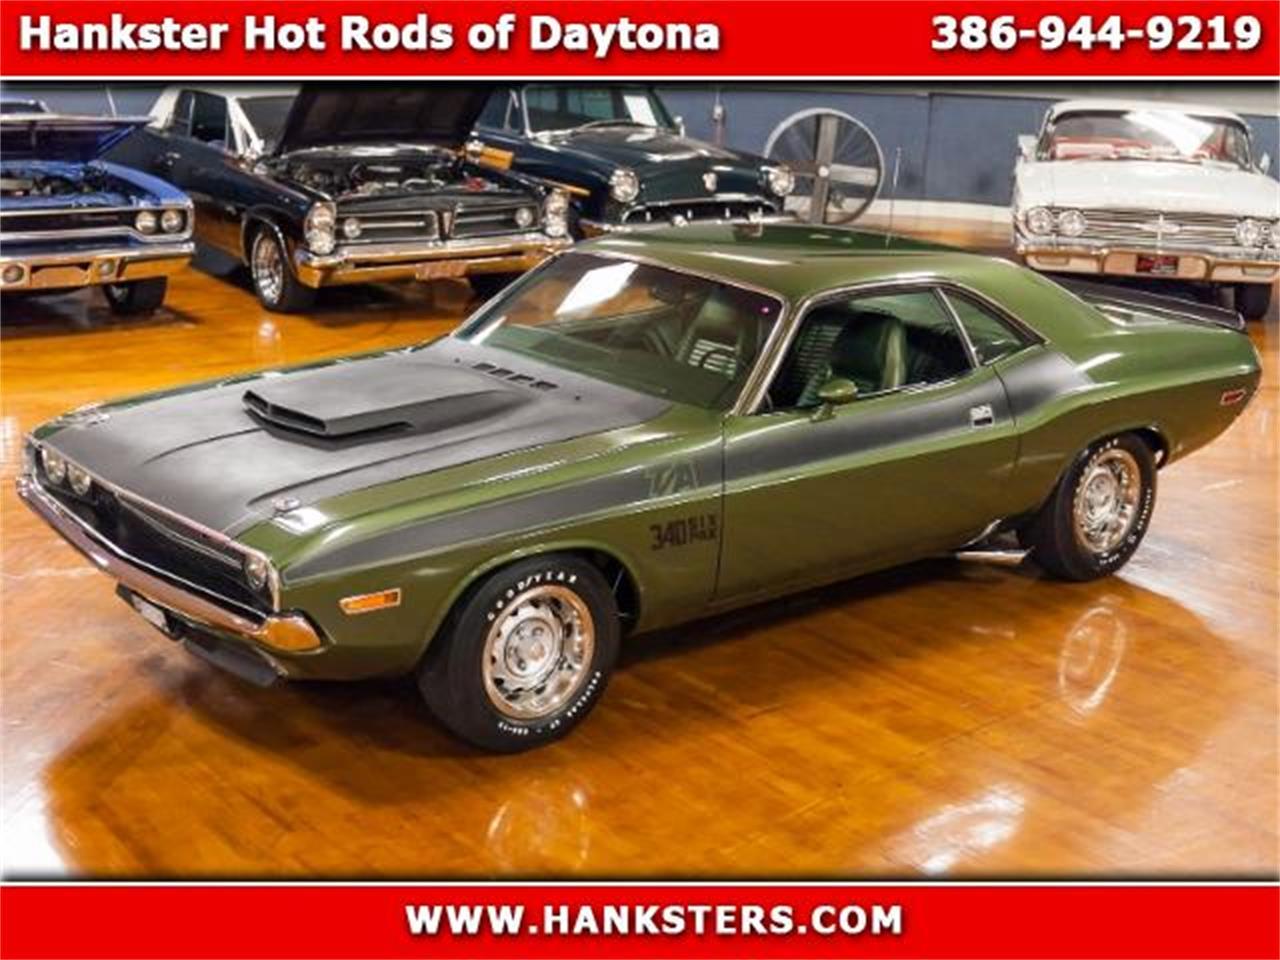 1970 Dodge Challenger For Sale Classiccarscom Cc 1094411